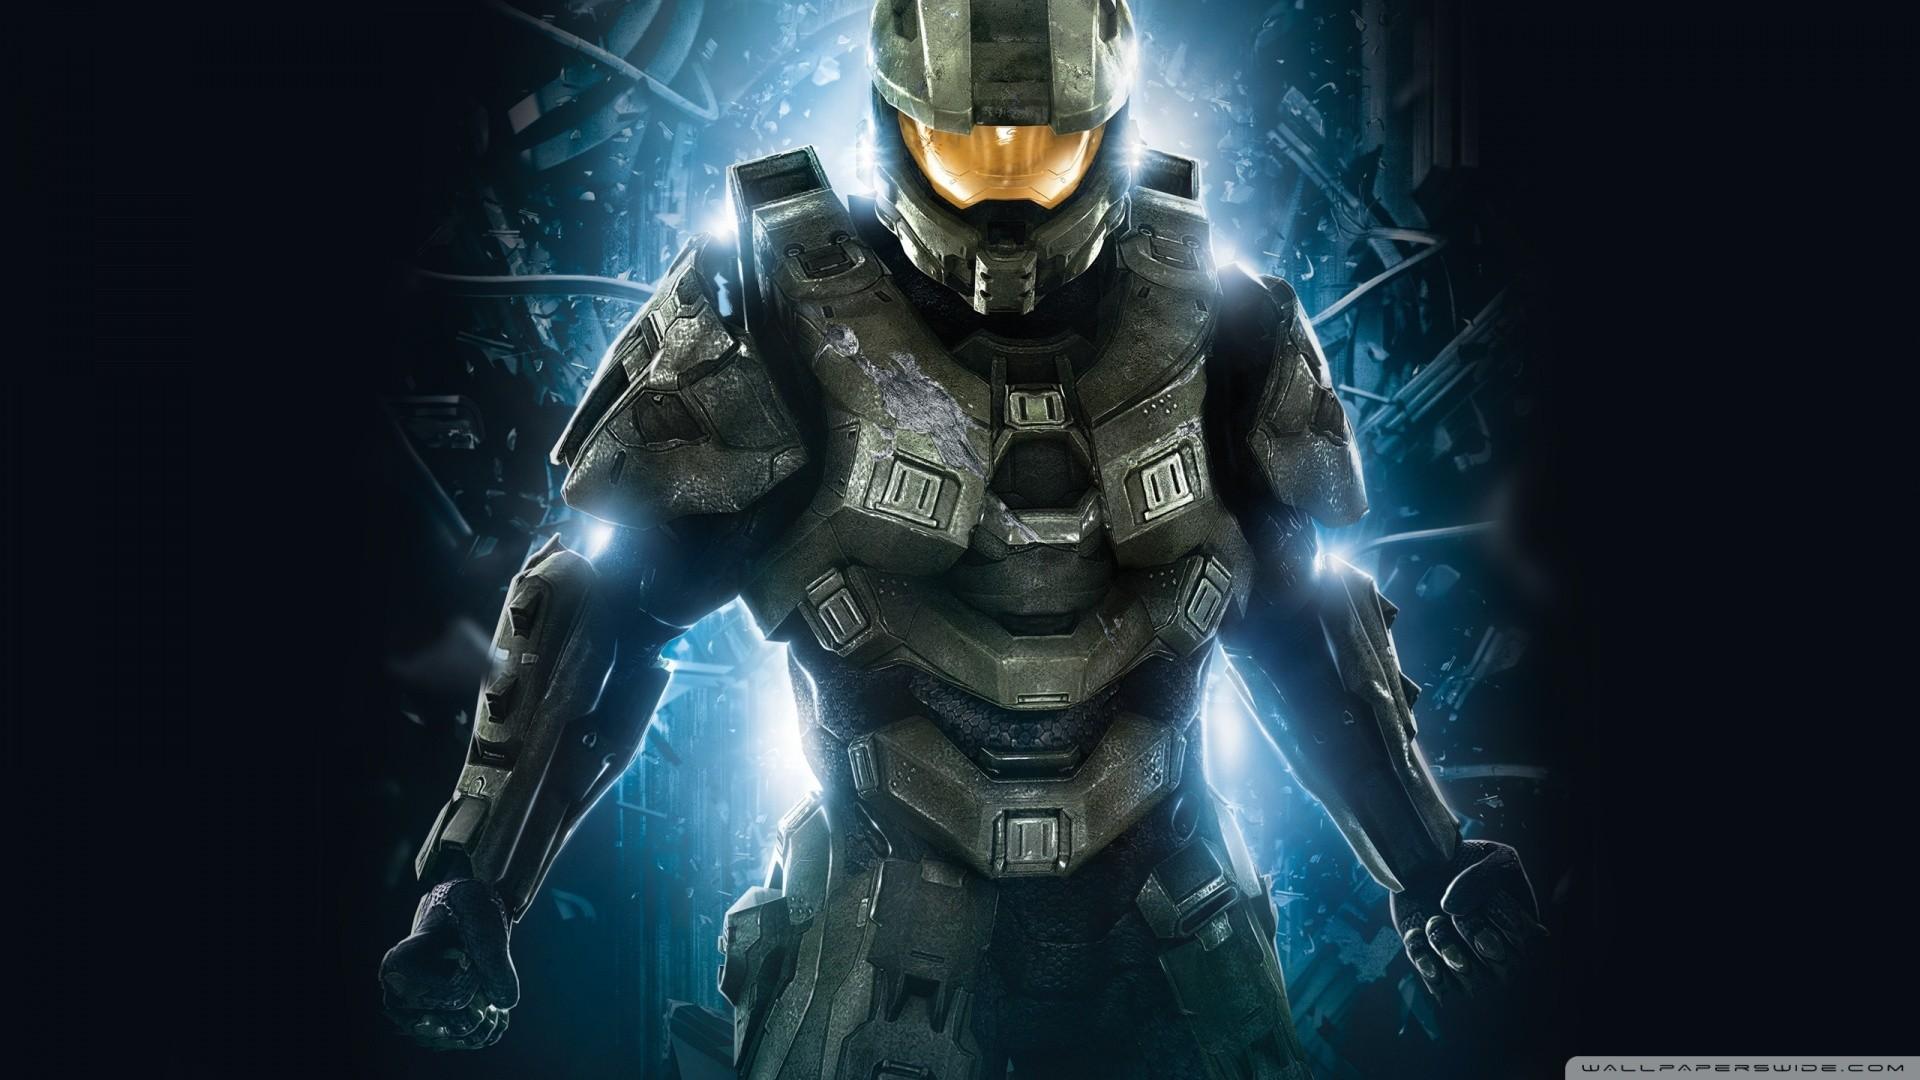 Halo 4 Master Chief HD desktop wallpaper : High Definition .